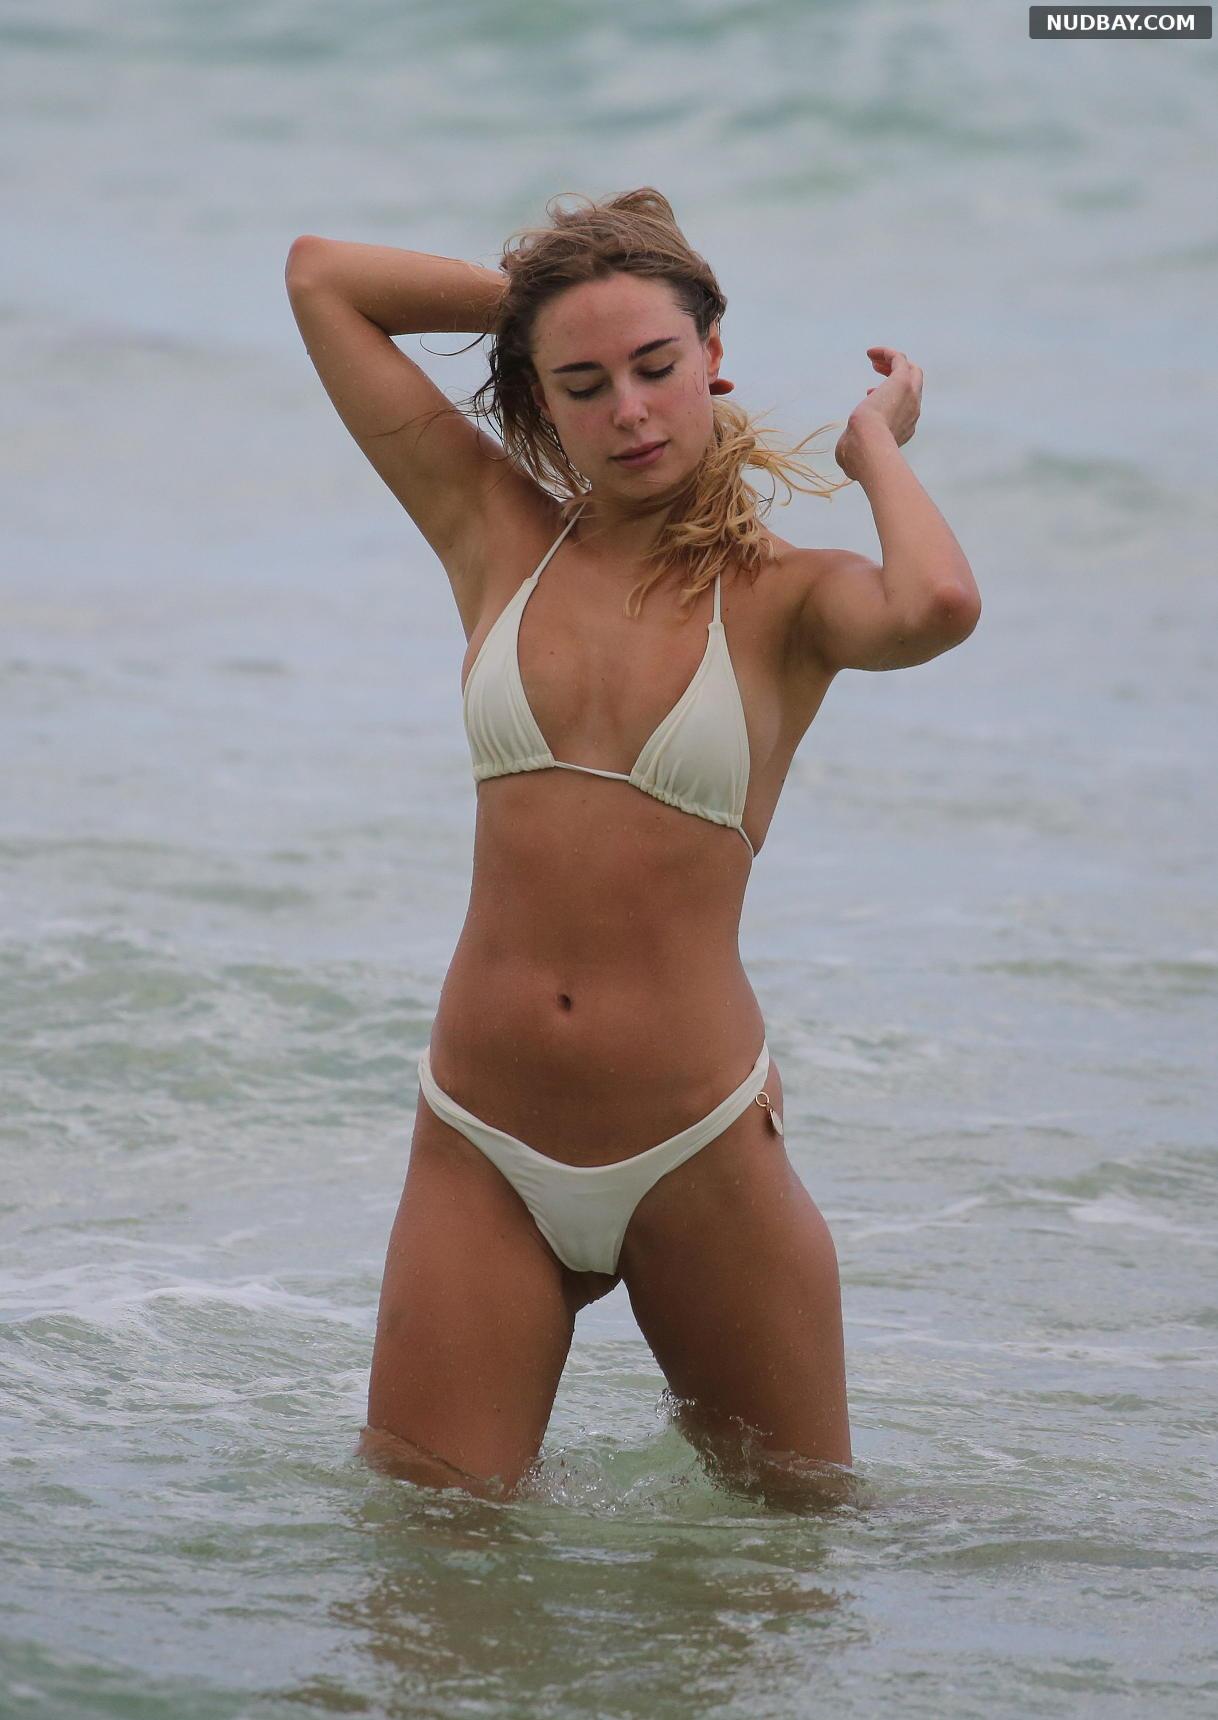 Kimberley Garner cameltoe bikini on holiday in Miami Apr 02 2019